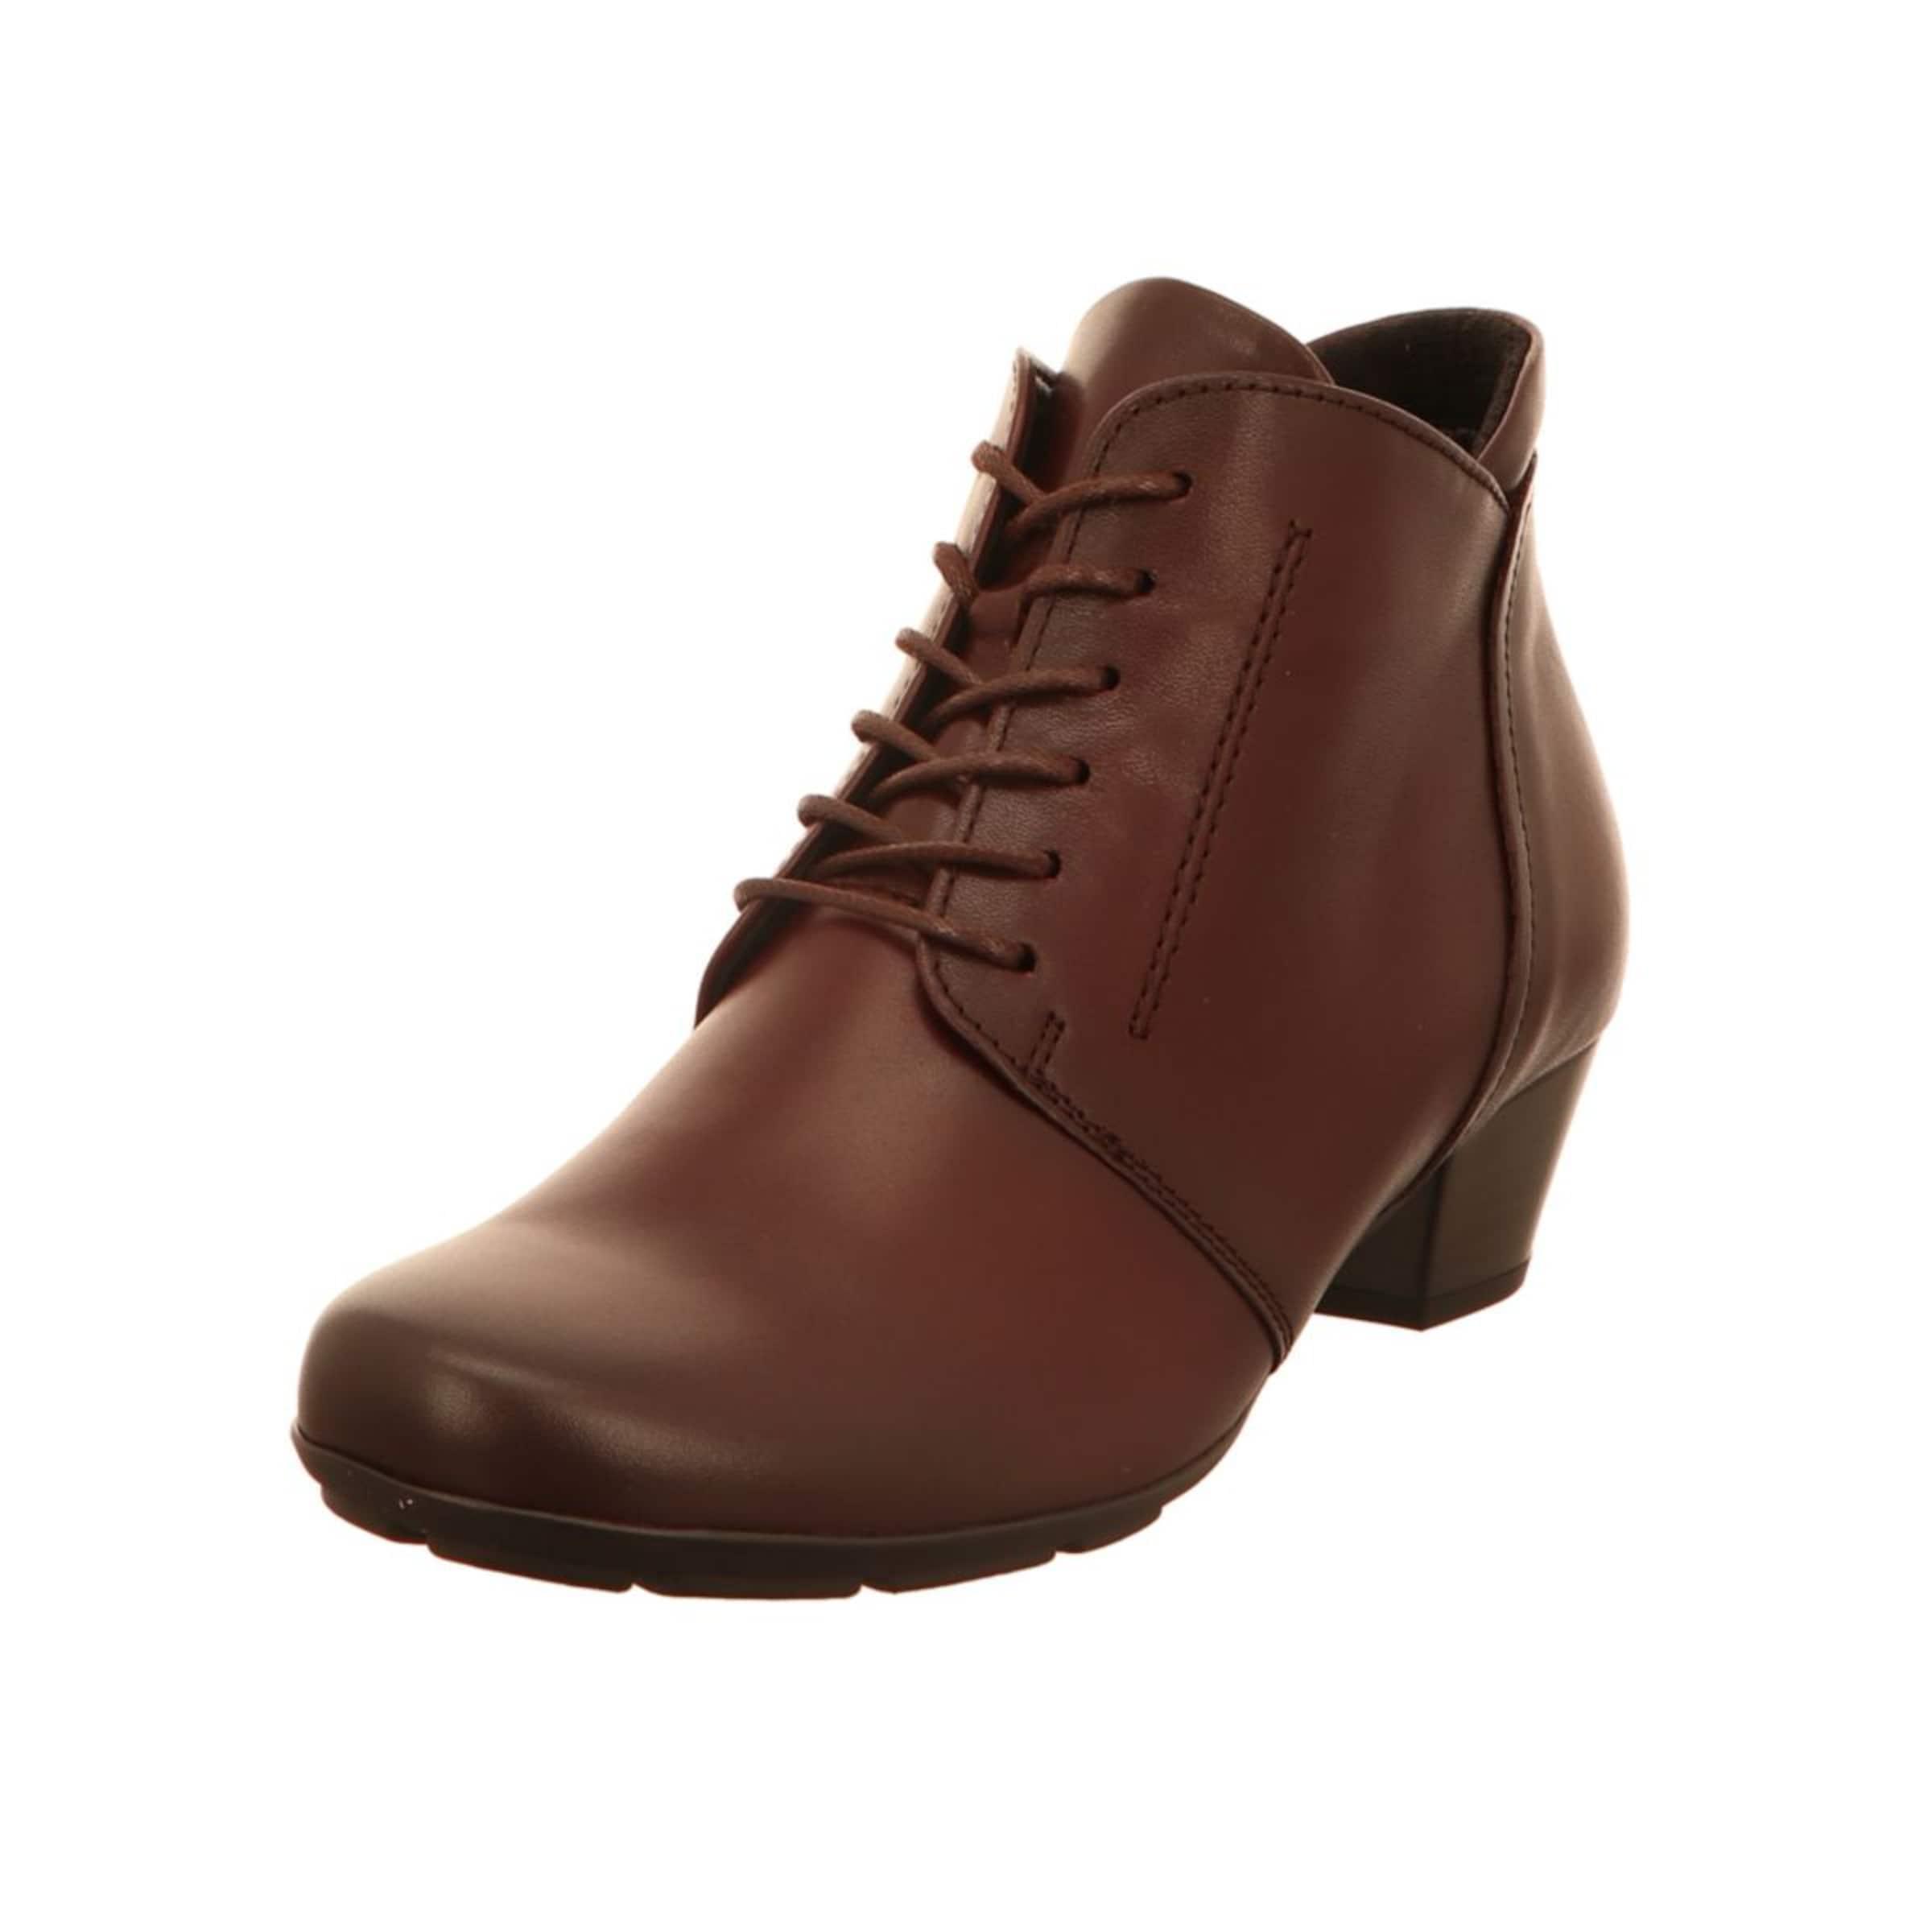 new product 8c01f a2e78 In Gabor In Gabor Gabor Stiefel Gabor In Stiefel Braun ...